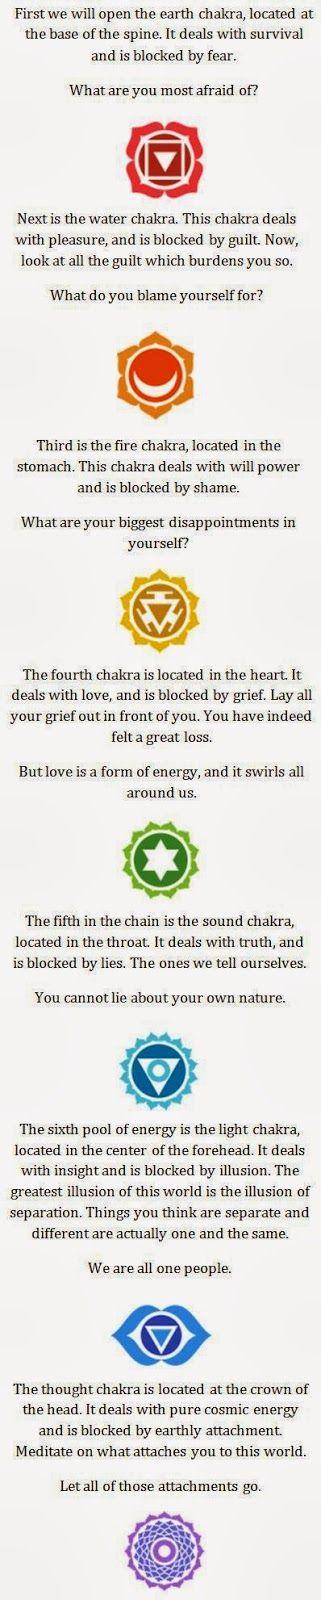 Spirituality-Network.com: Infographic: Chakra Meditation